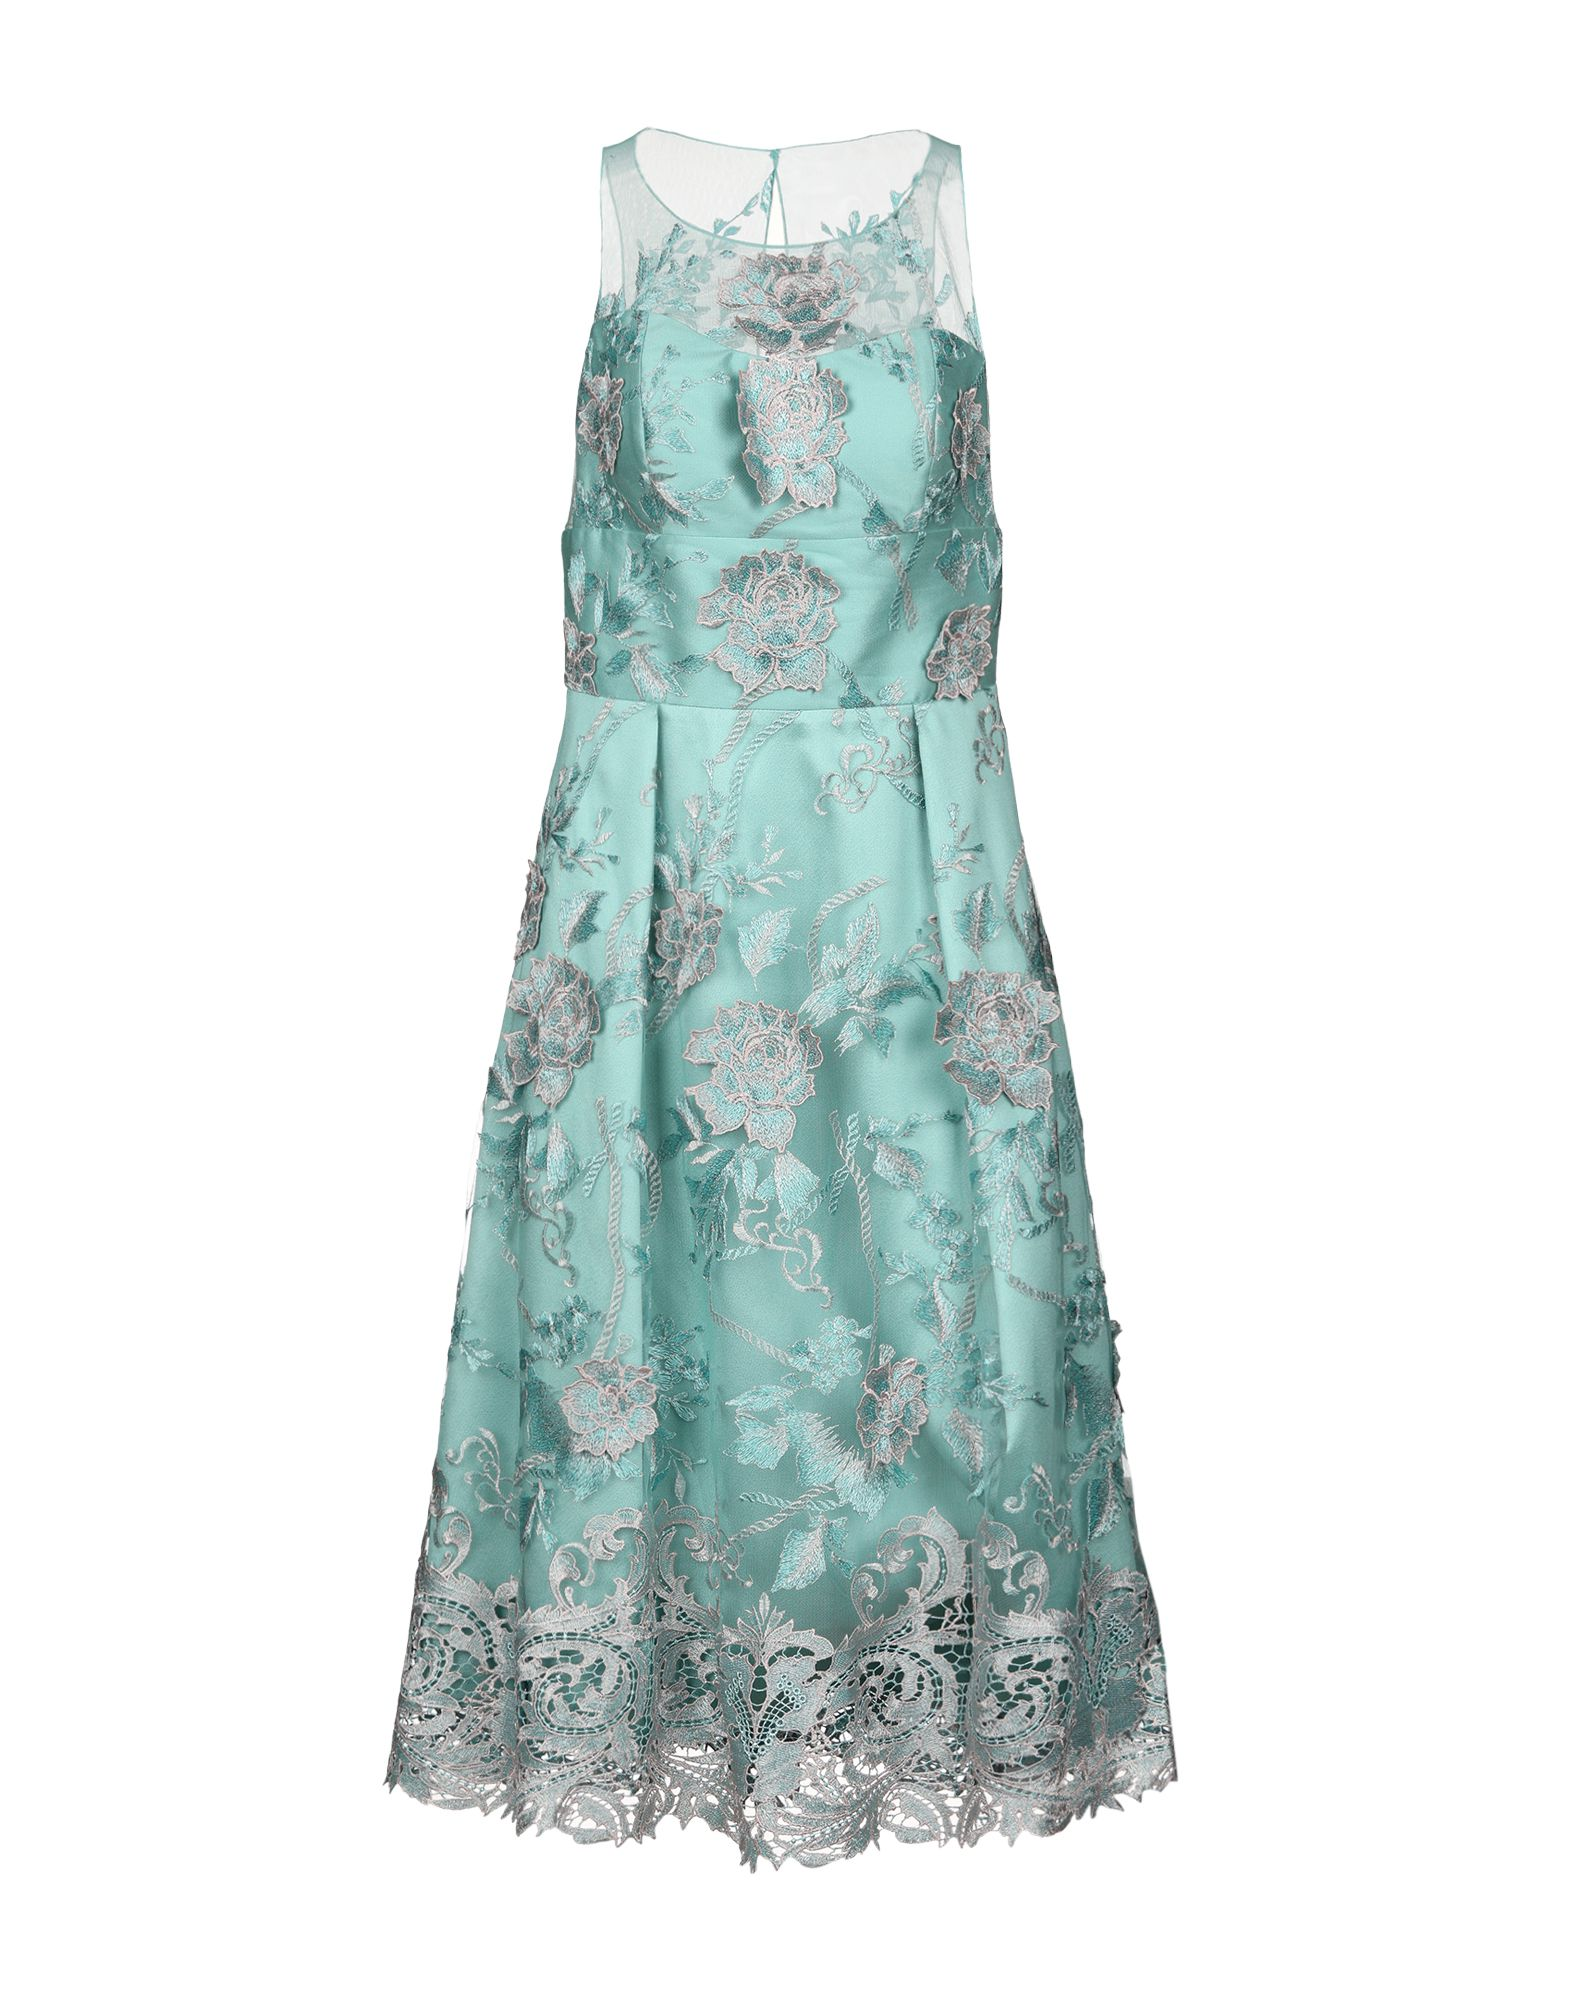 ATELIER NICOLA D'ERRICO Платье длиной 3/4